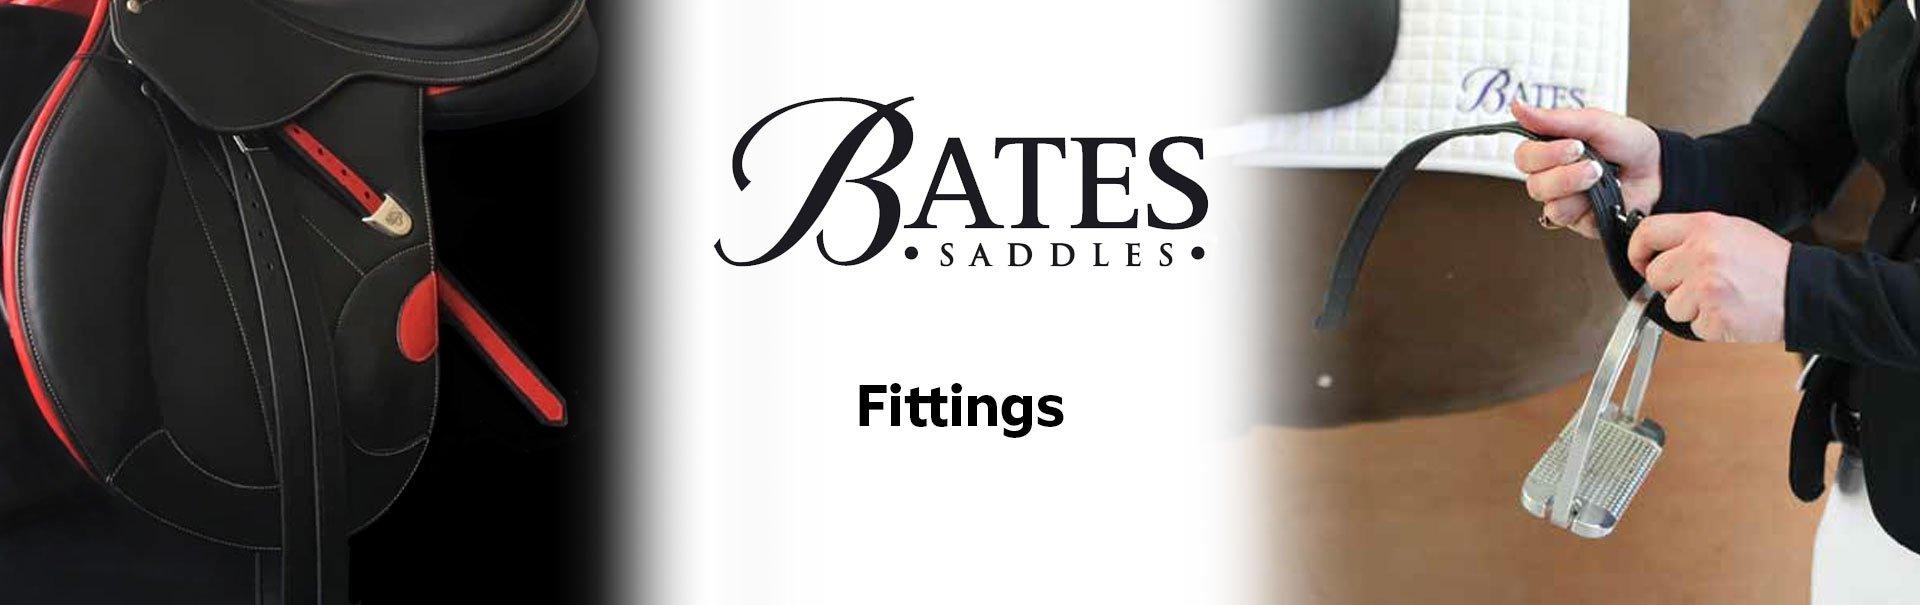 Bates Fittings